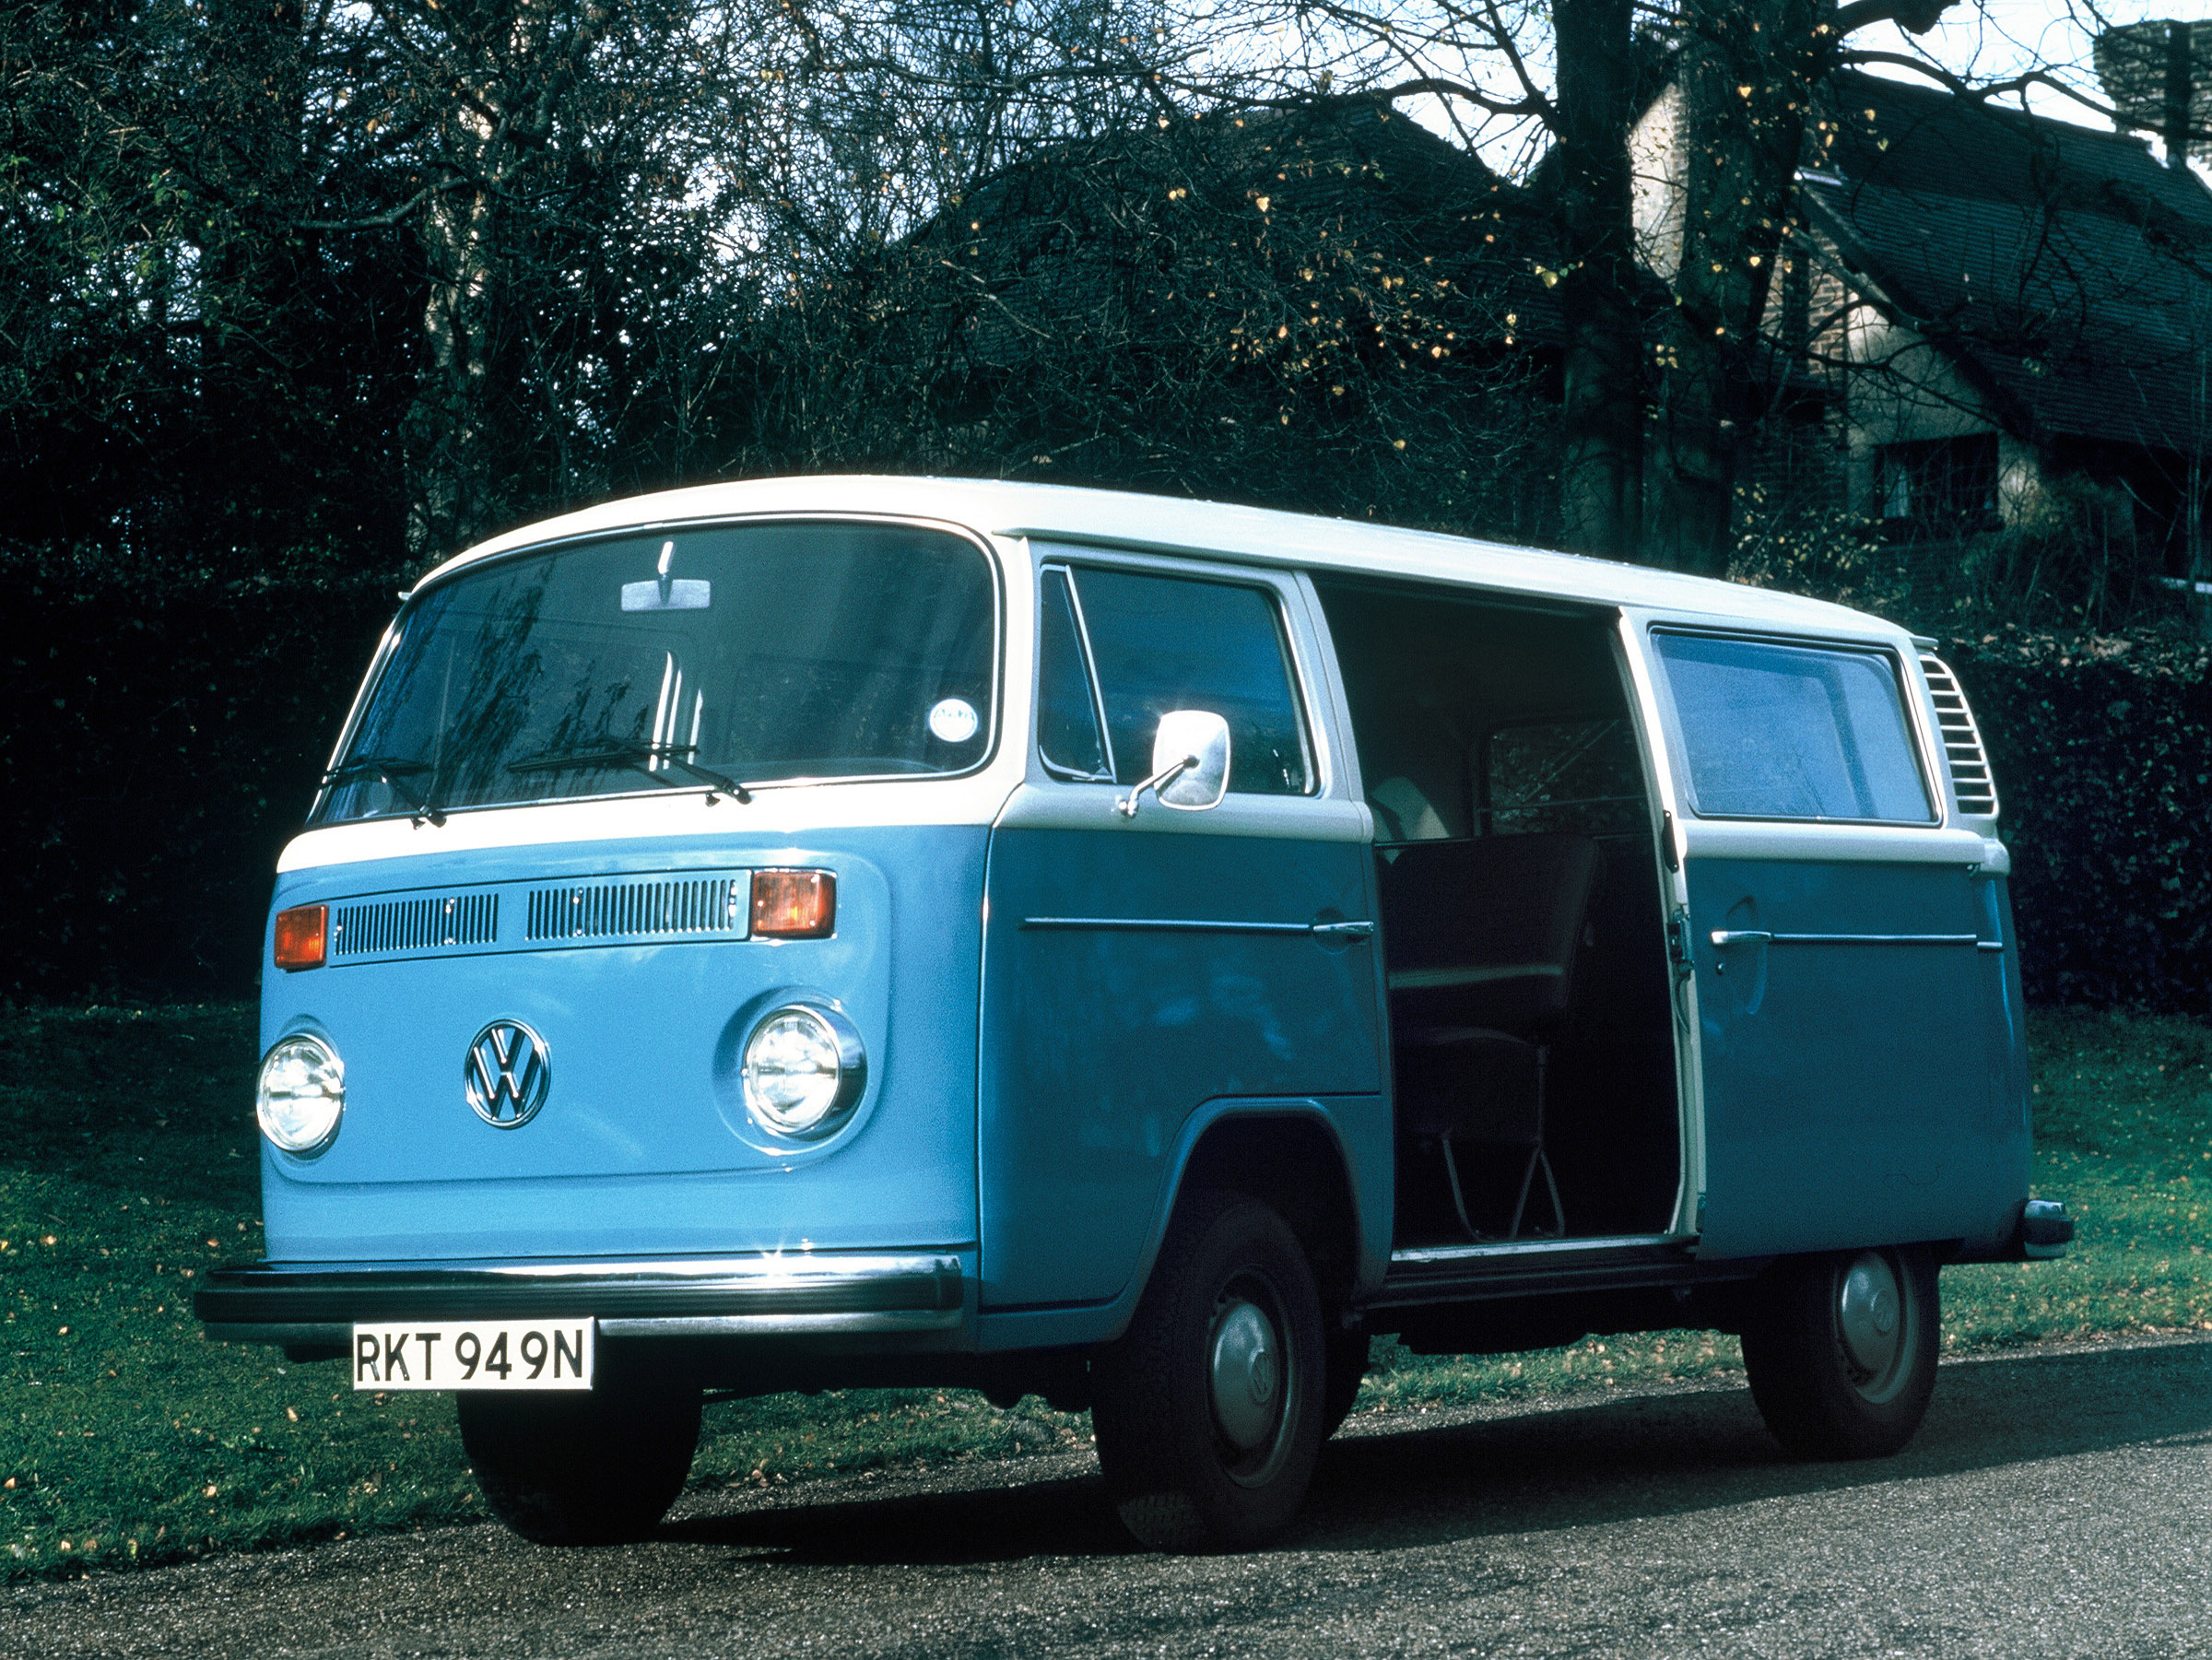 e931e25581 VW Camper Van 1974 - Picture 14464